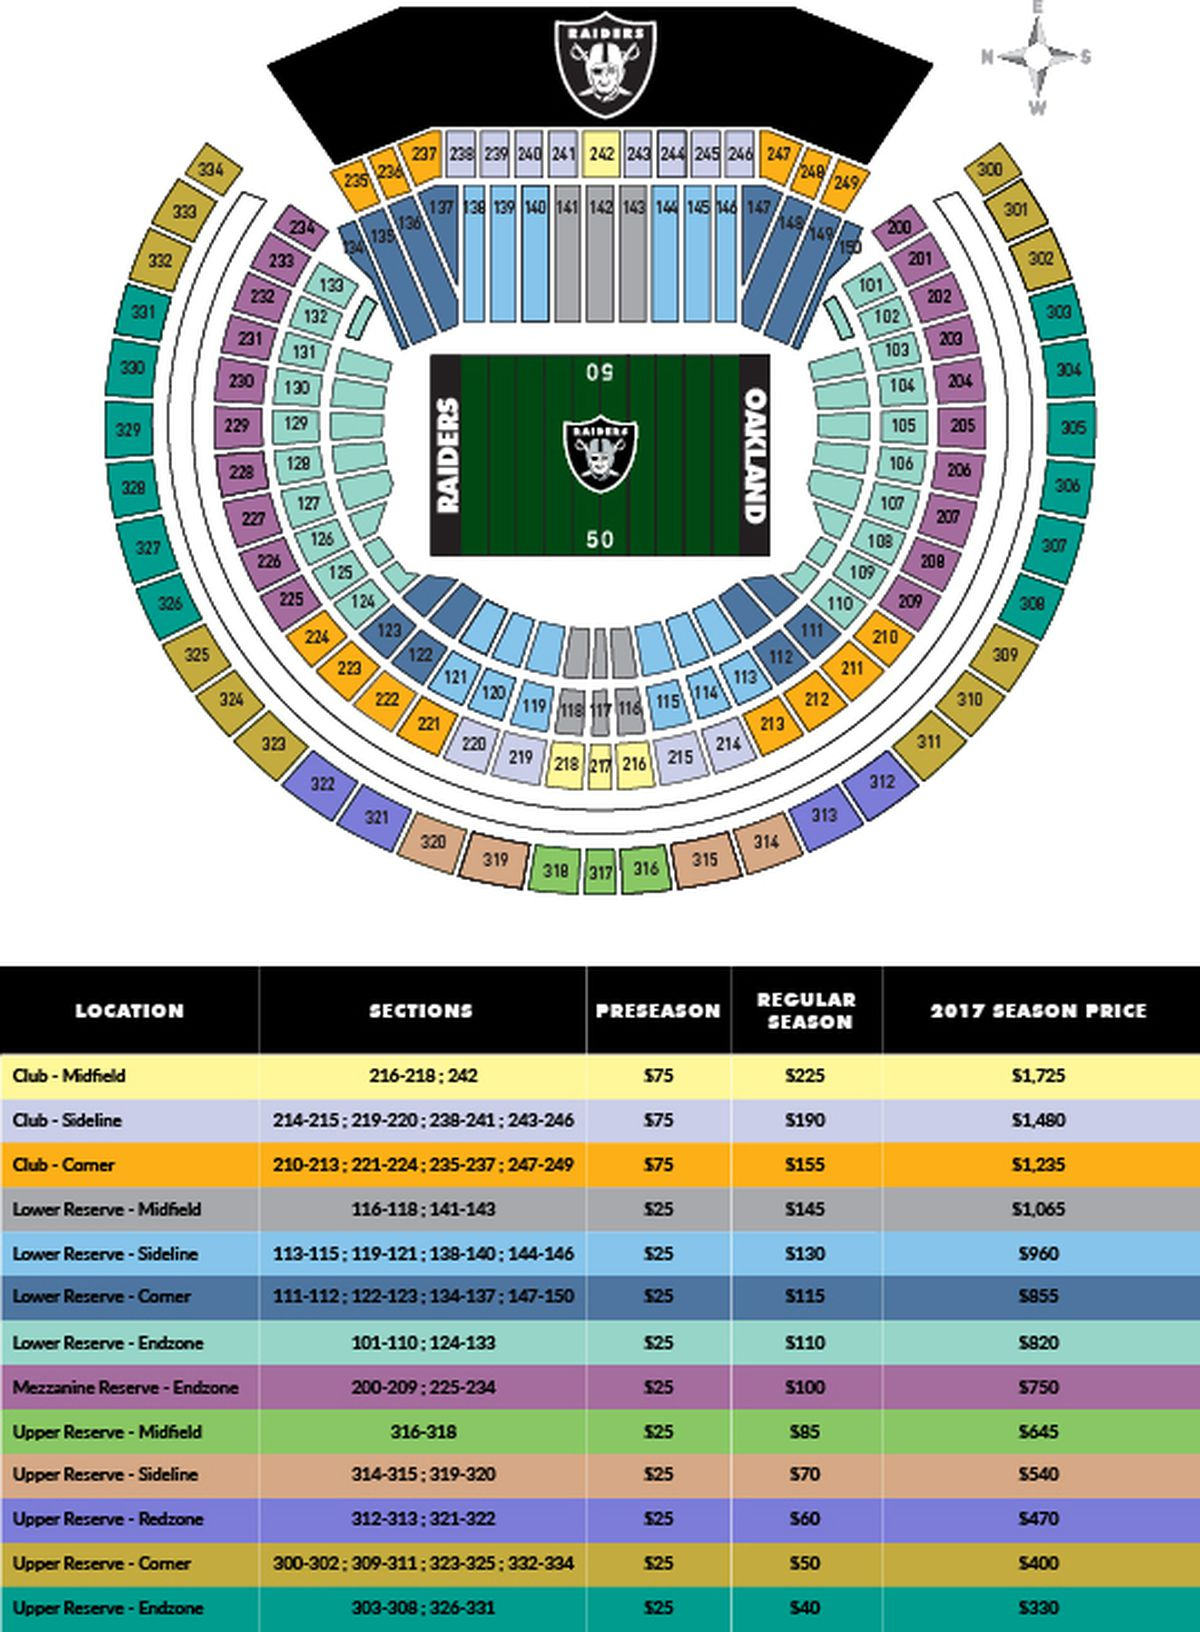 Raiders 2017 ticket prices